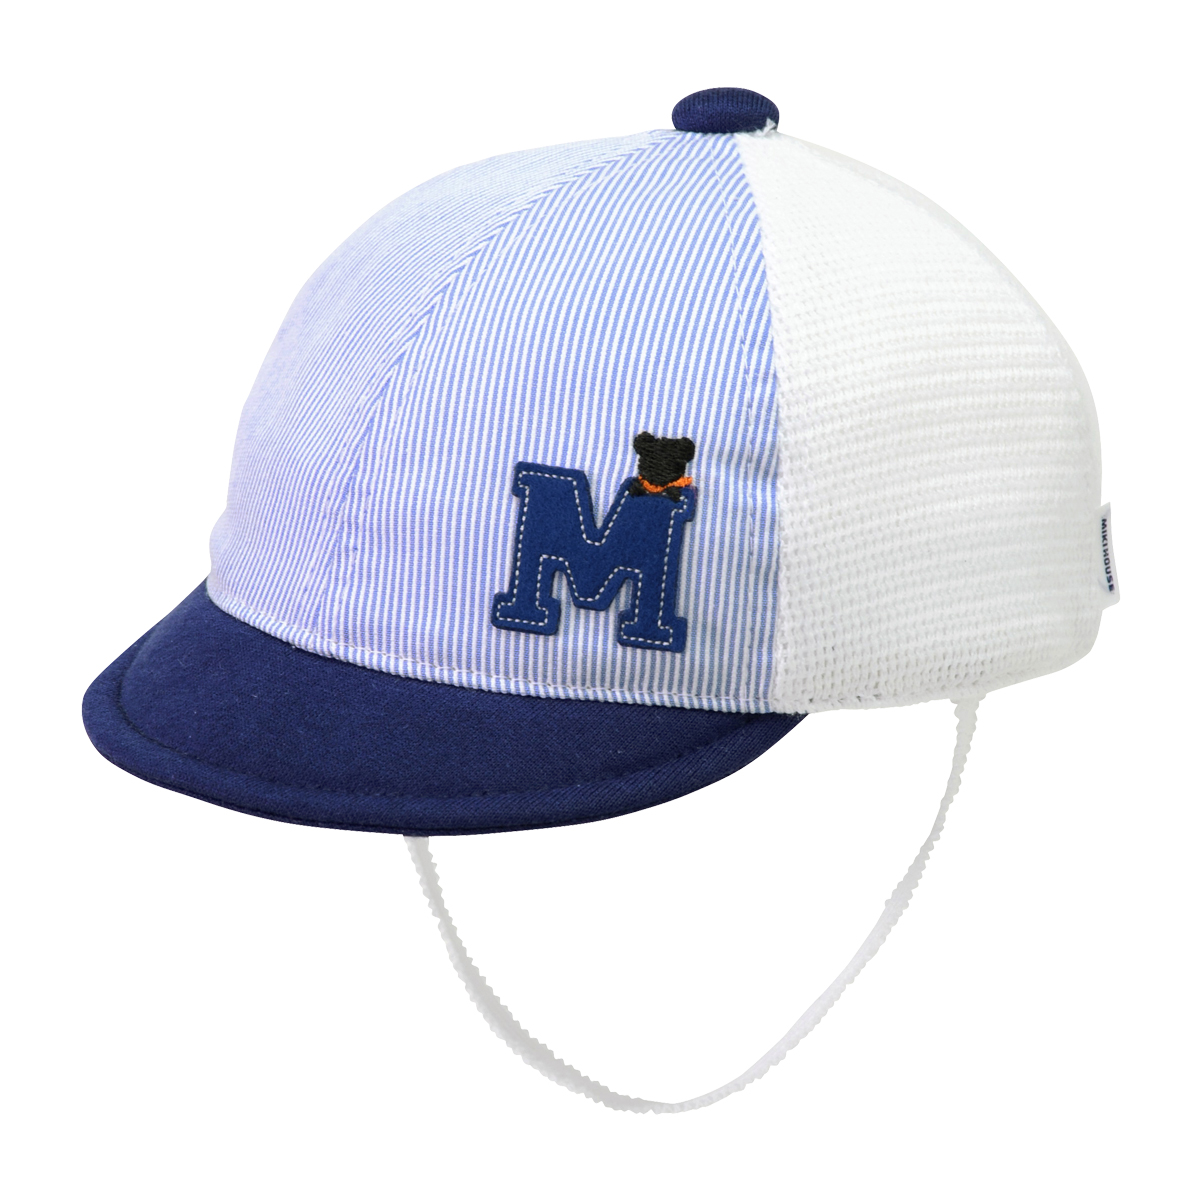 Mワッペン付メッシュキャップ(帽子)〈SS-S(40cm-48cm)〉ミキハウス mikihouse